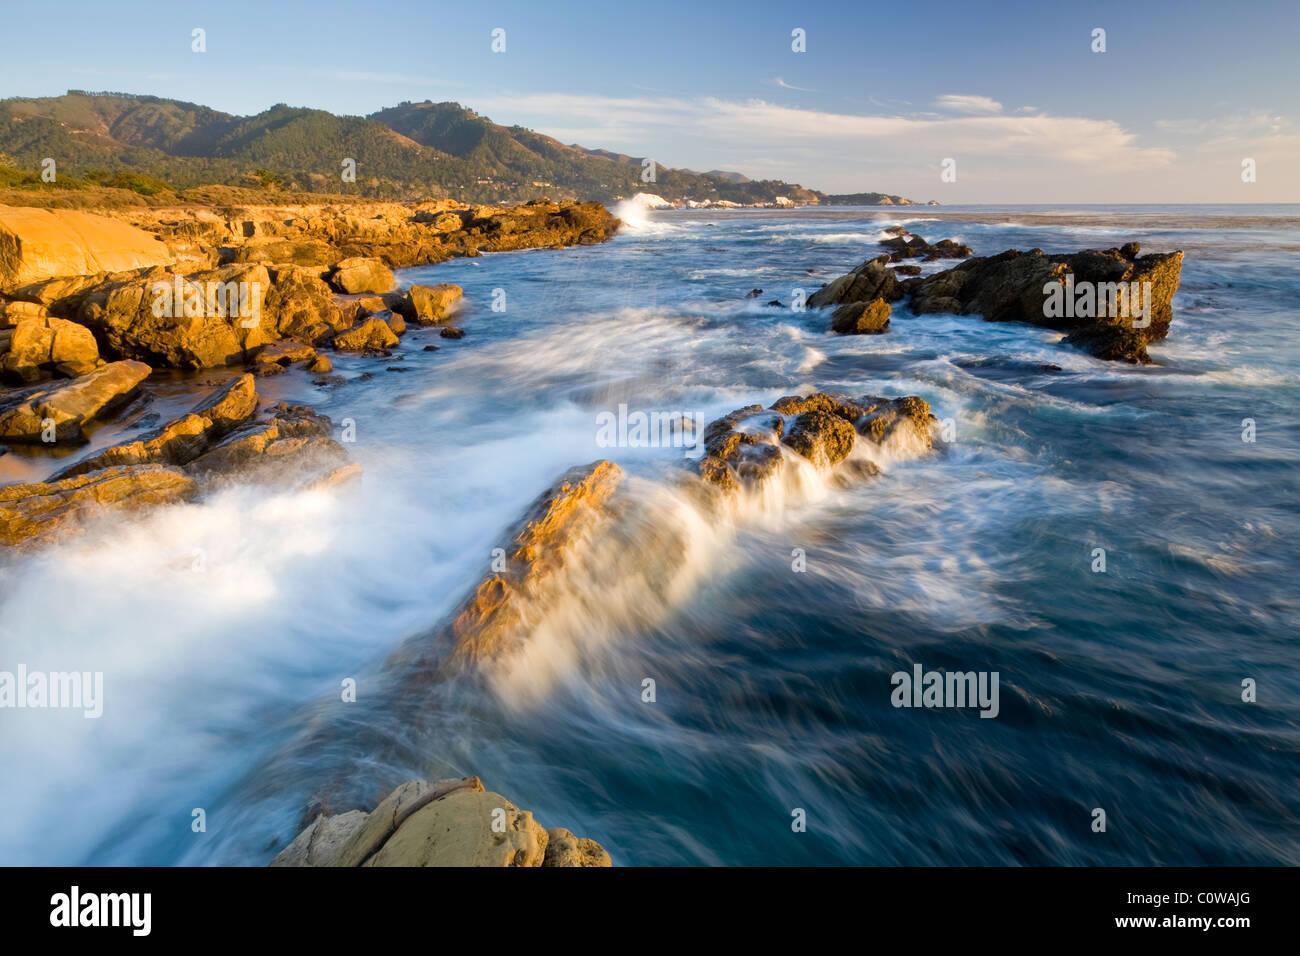 Point Lobos State Park, California. - Stock Image